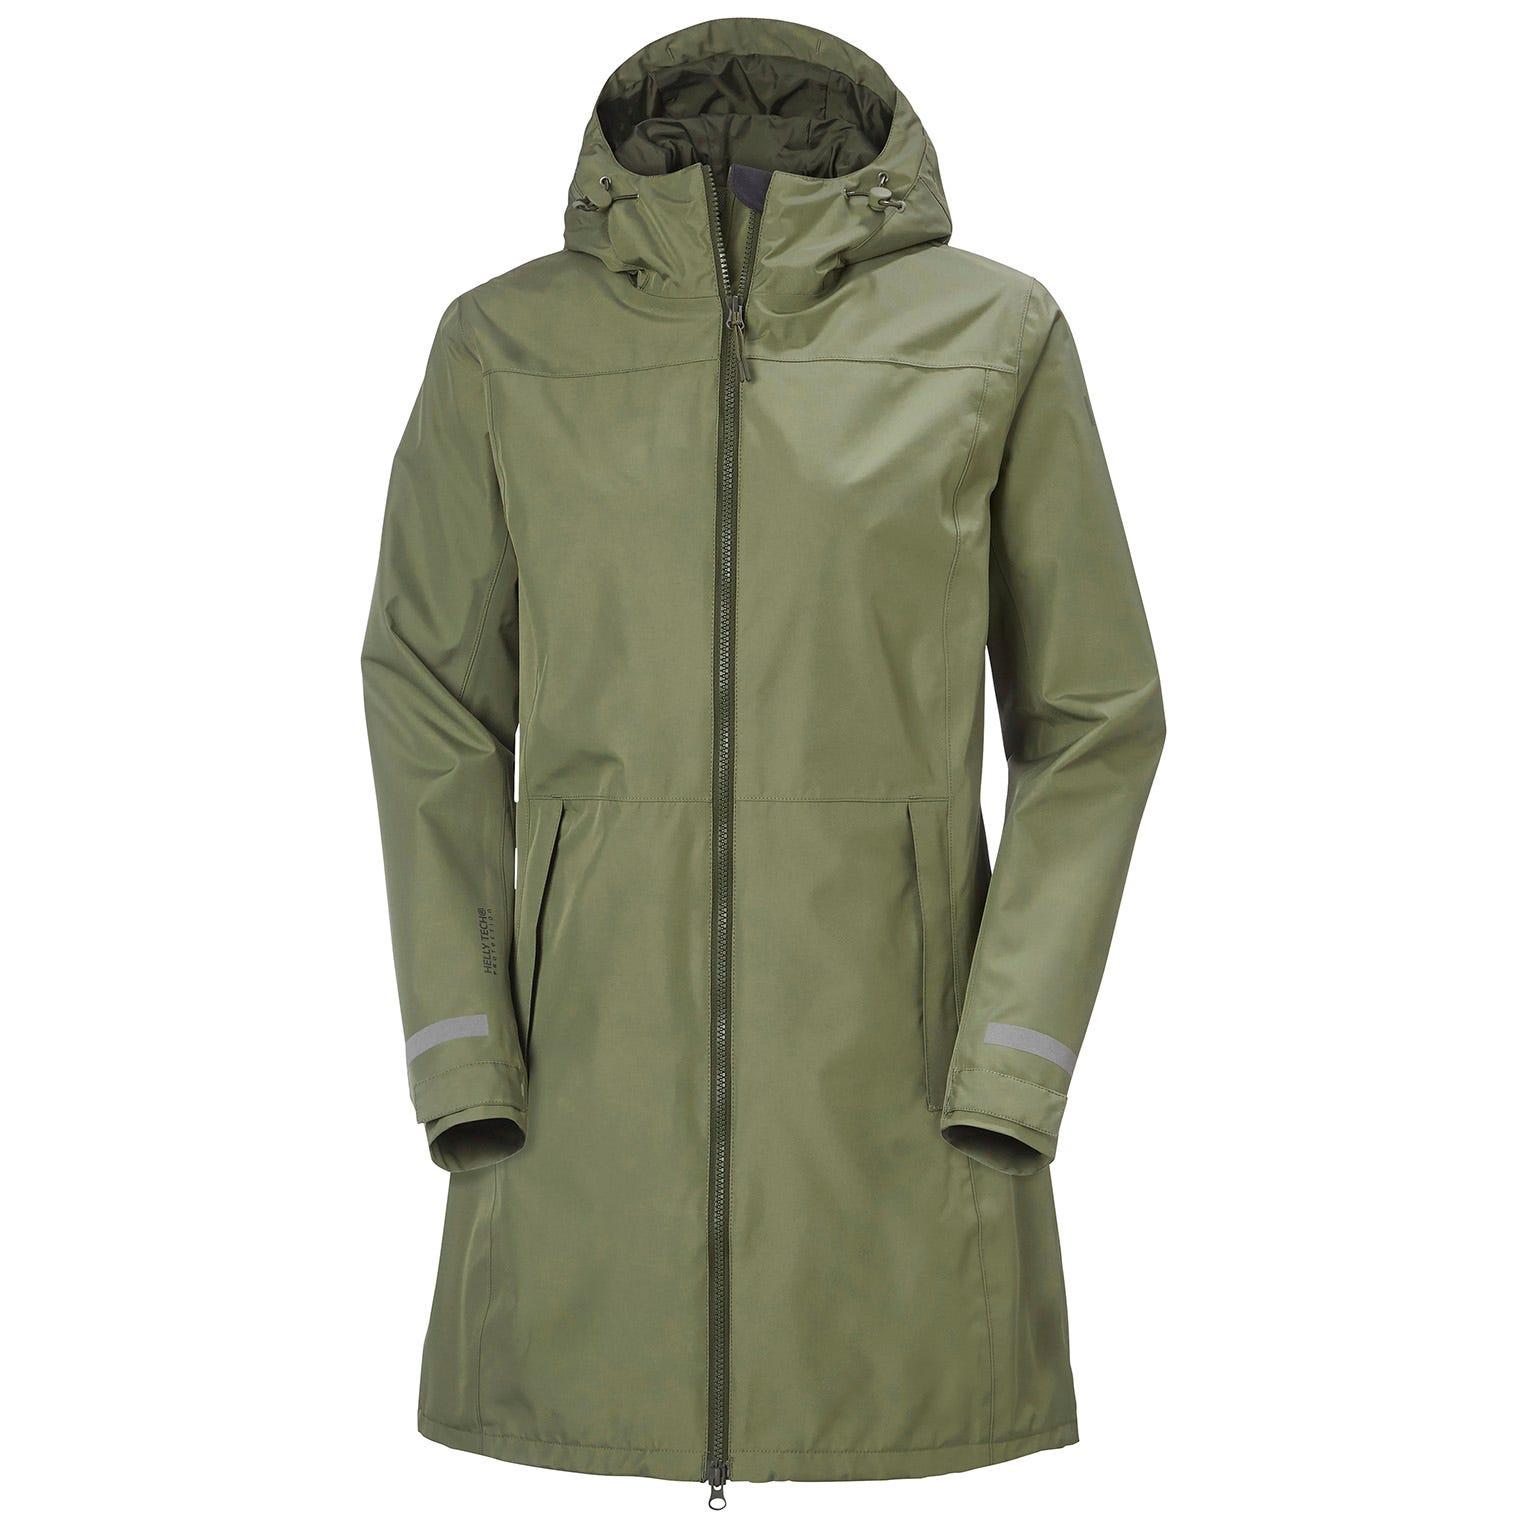 Helly Hansen Womens Lisburn Waterproof Urban Raincoat XL